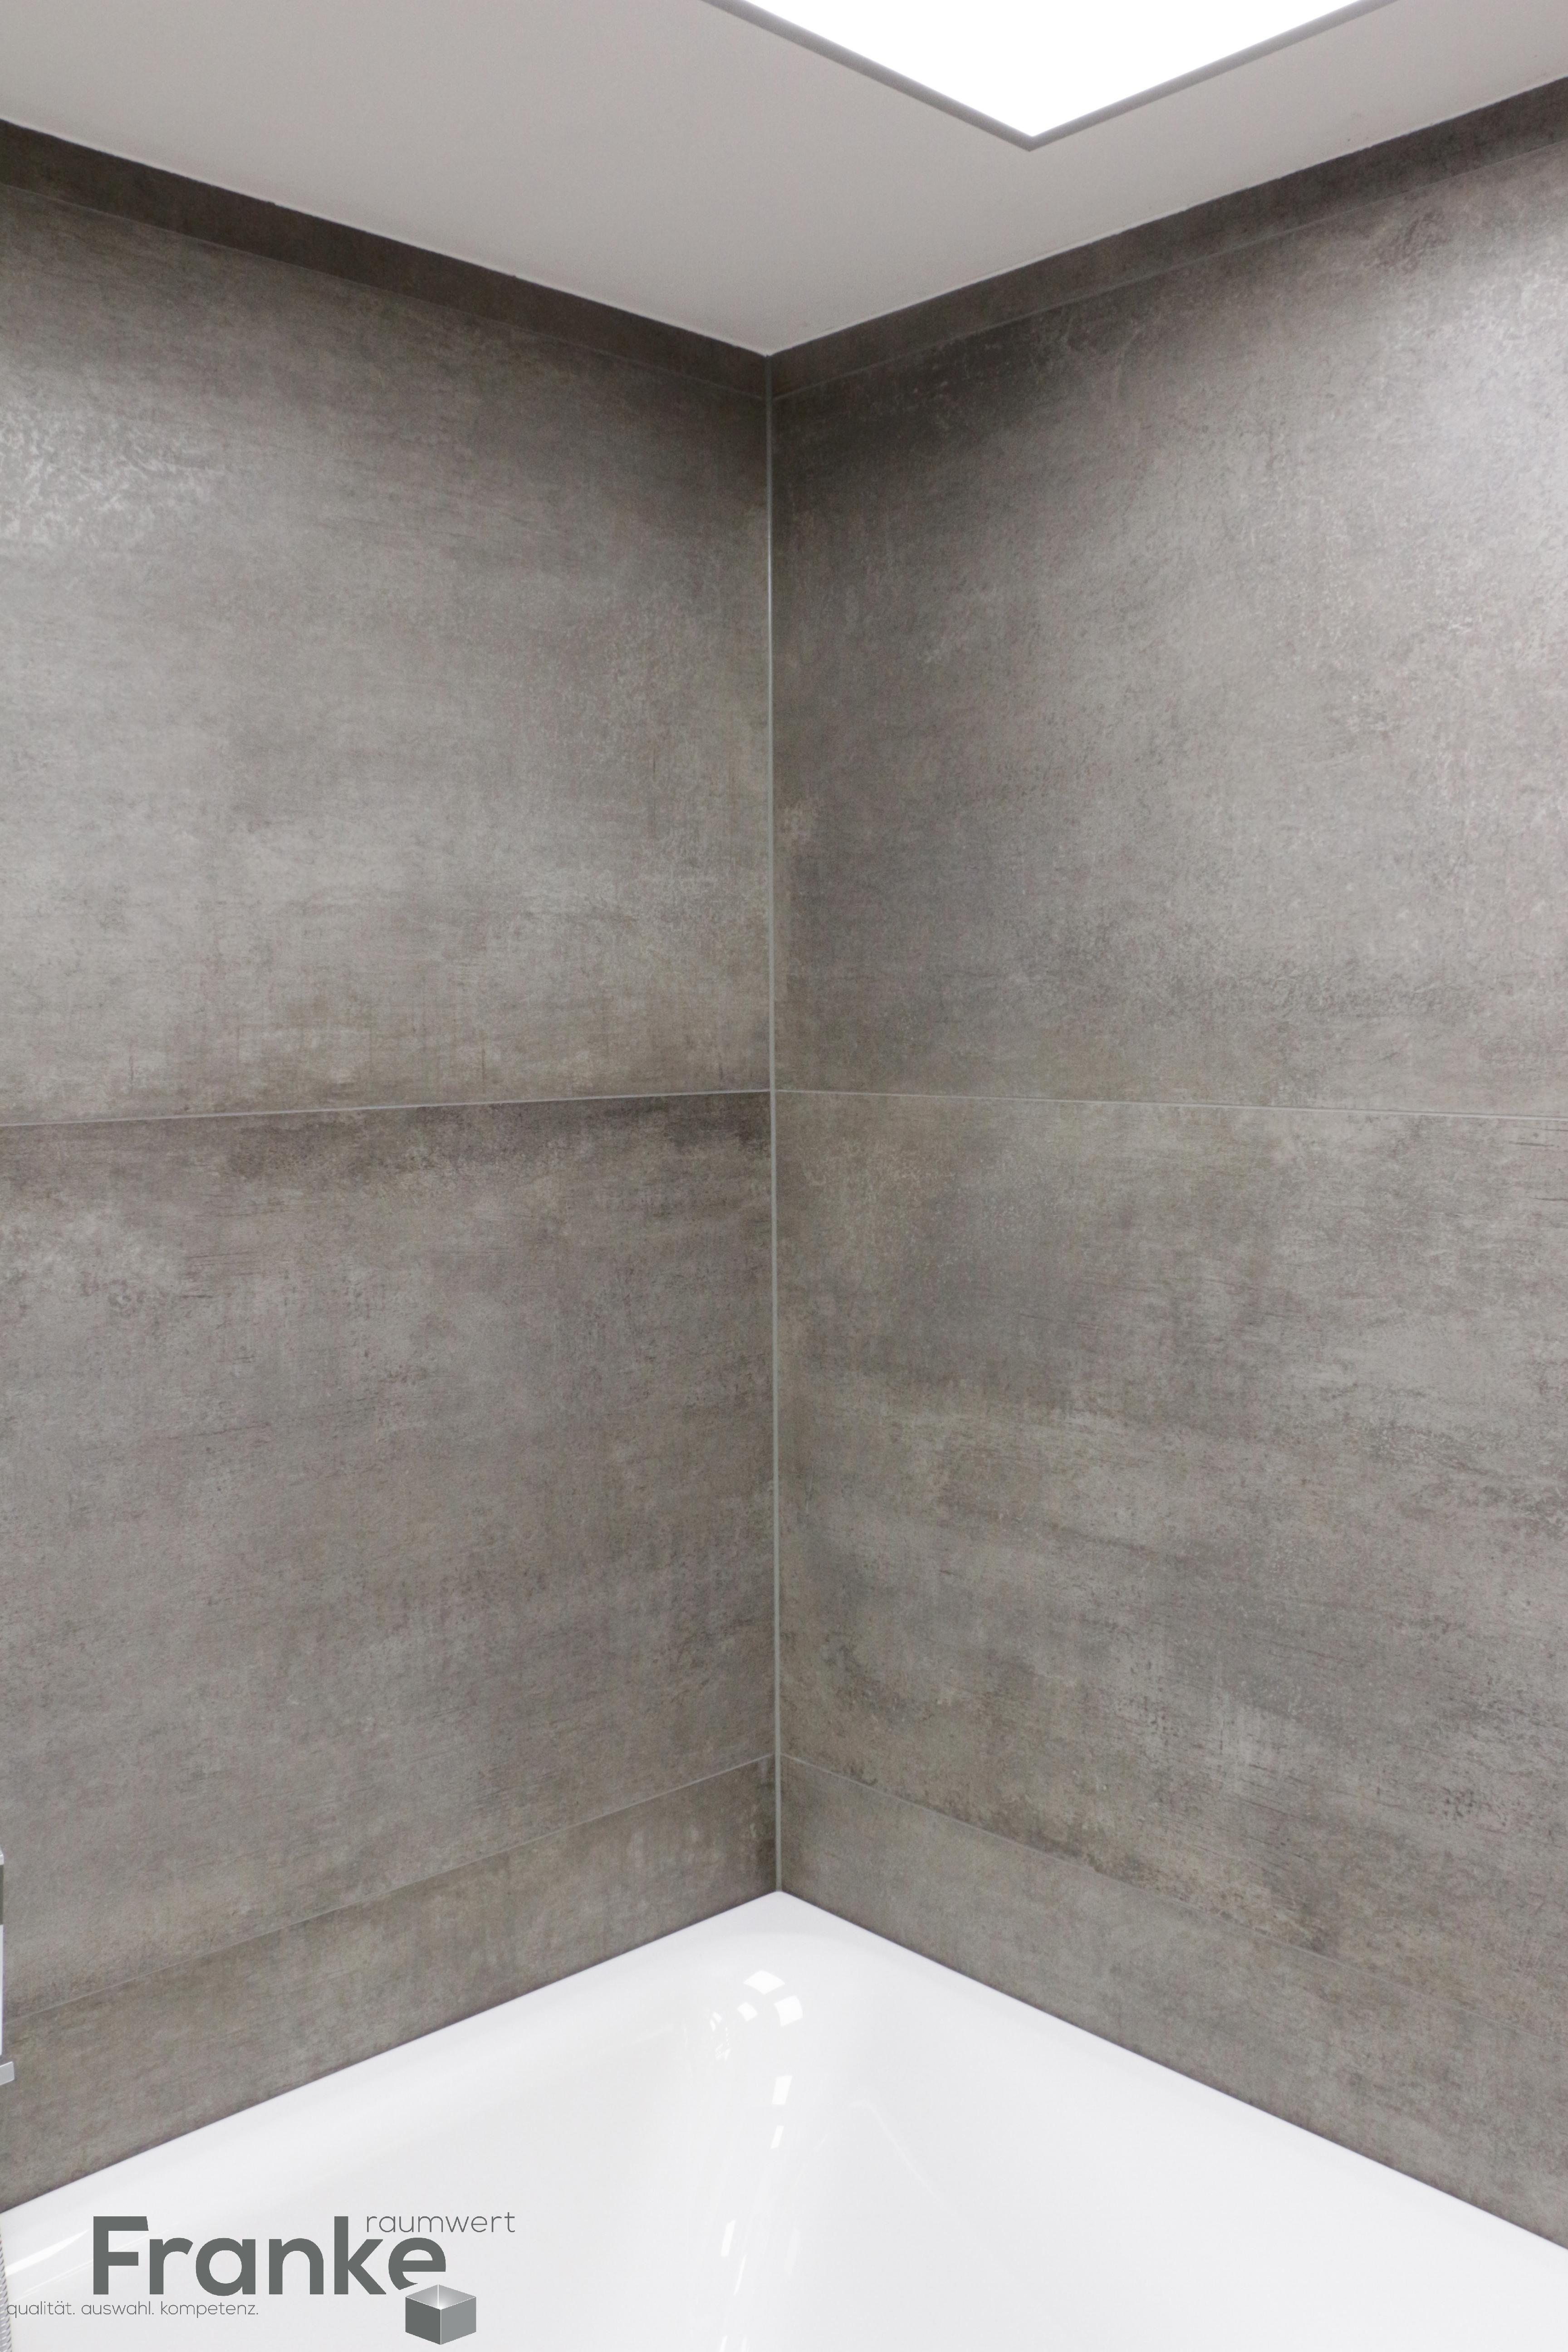 Minimalistisches Fugenbild Durch Xxl Format 80x180 Cm Neue Serie Prima Materia Neuste Betonoptik Http Badezimmer Fliesen Badezimmer Badezimmer Fliesen Xxl